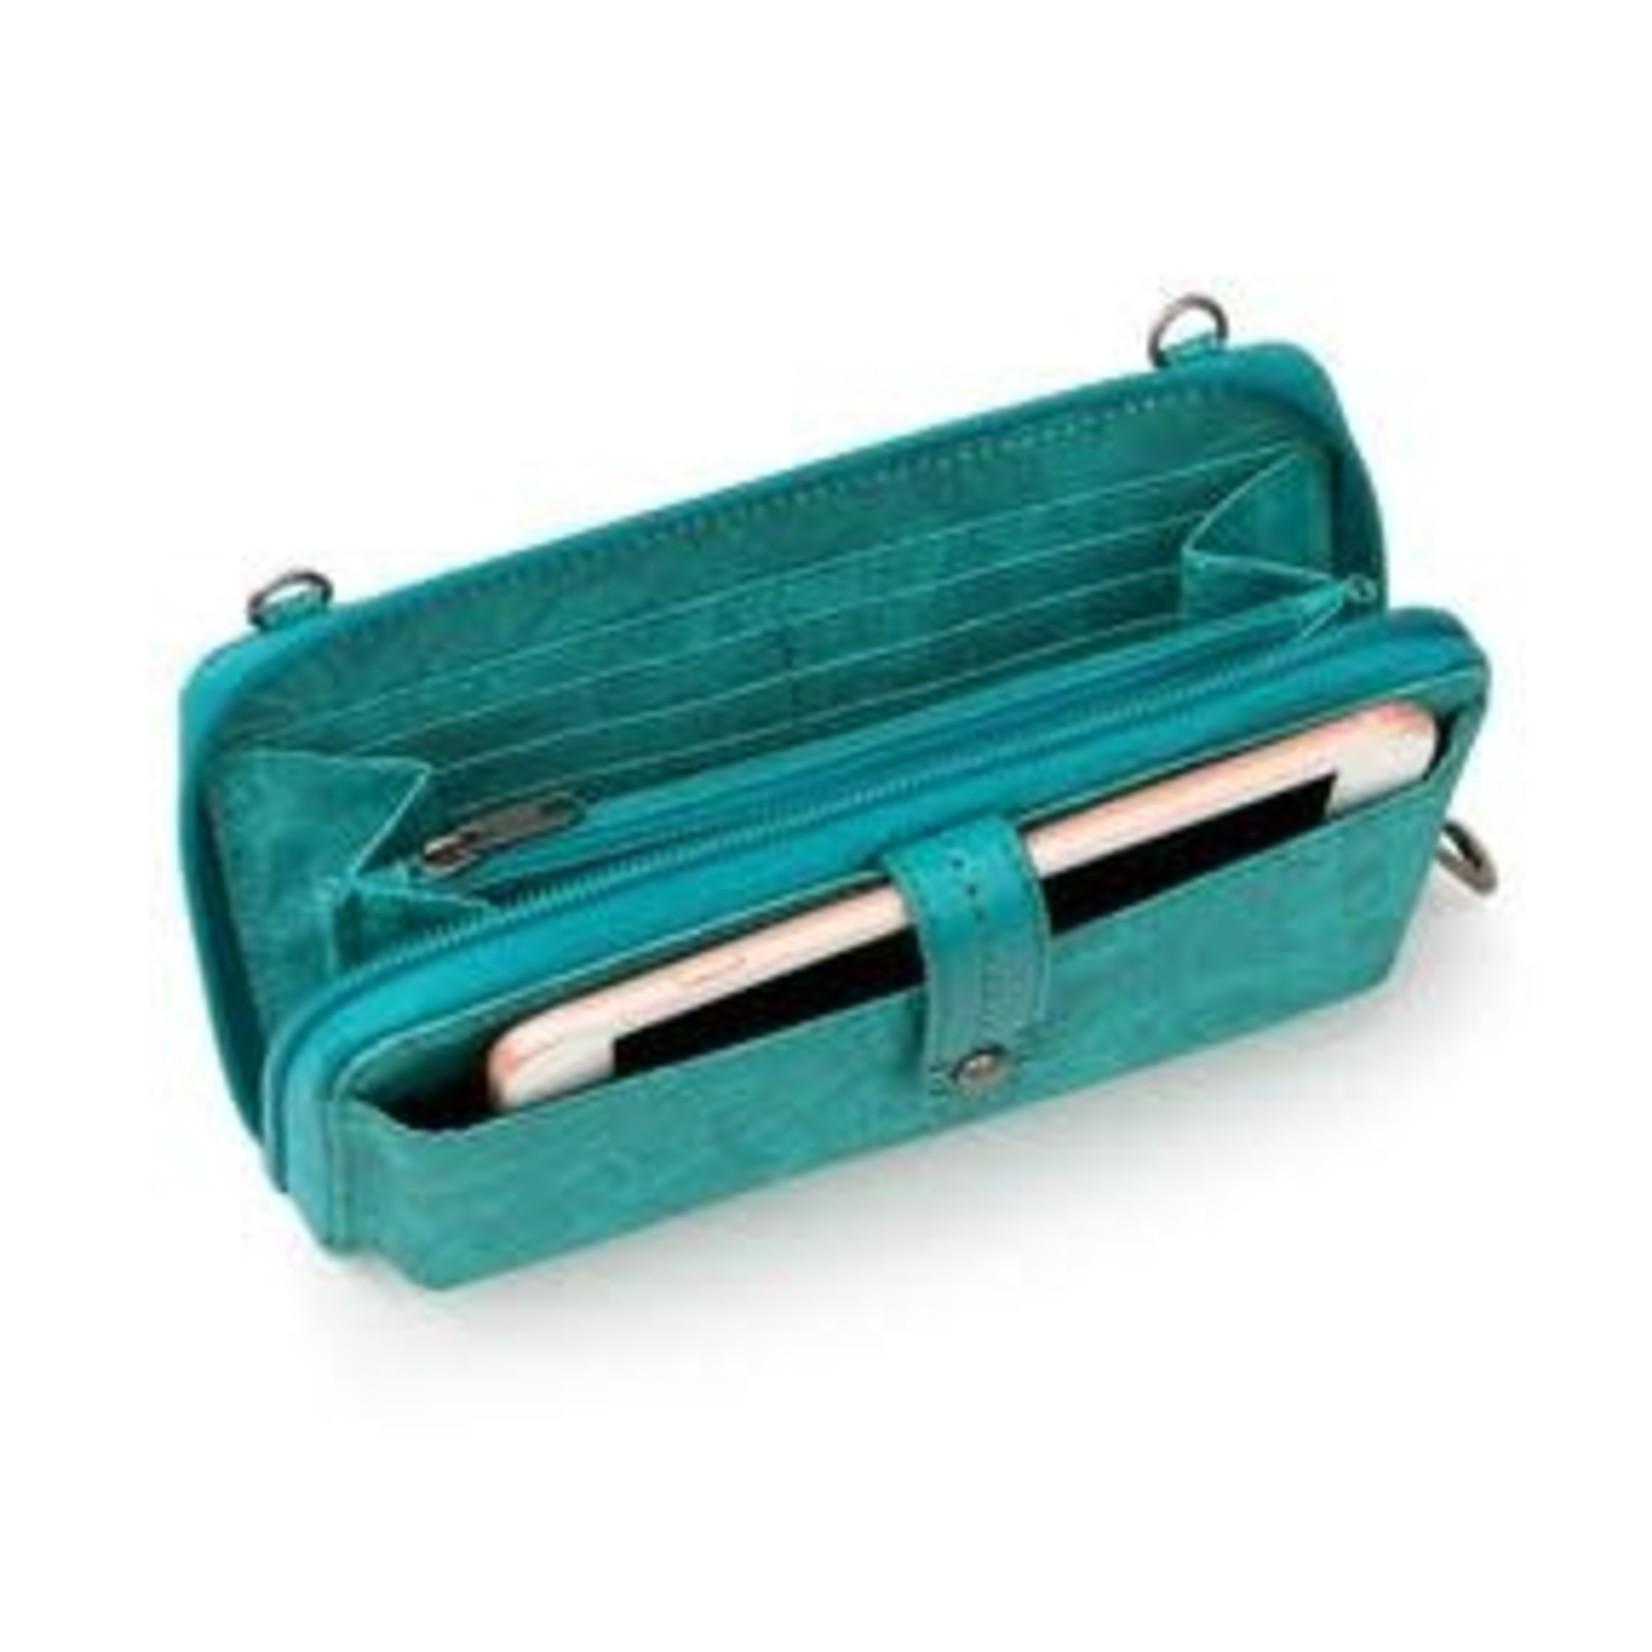 SakRoots Large Smartphone Crossbody - Turquoise Tonal Spirit Desert